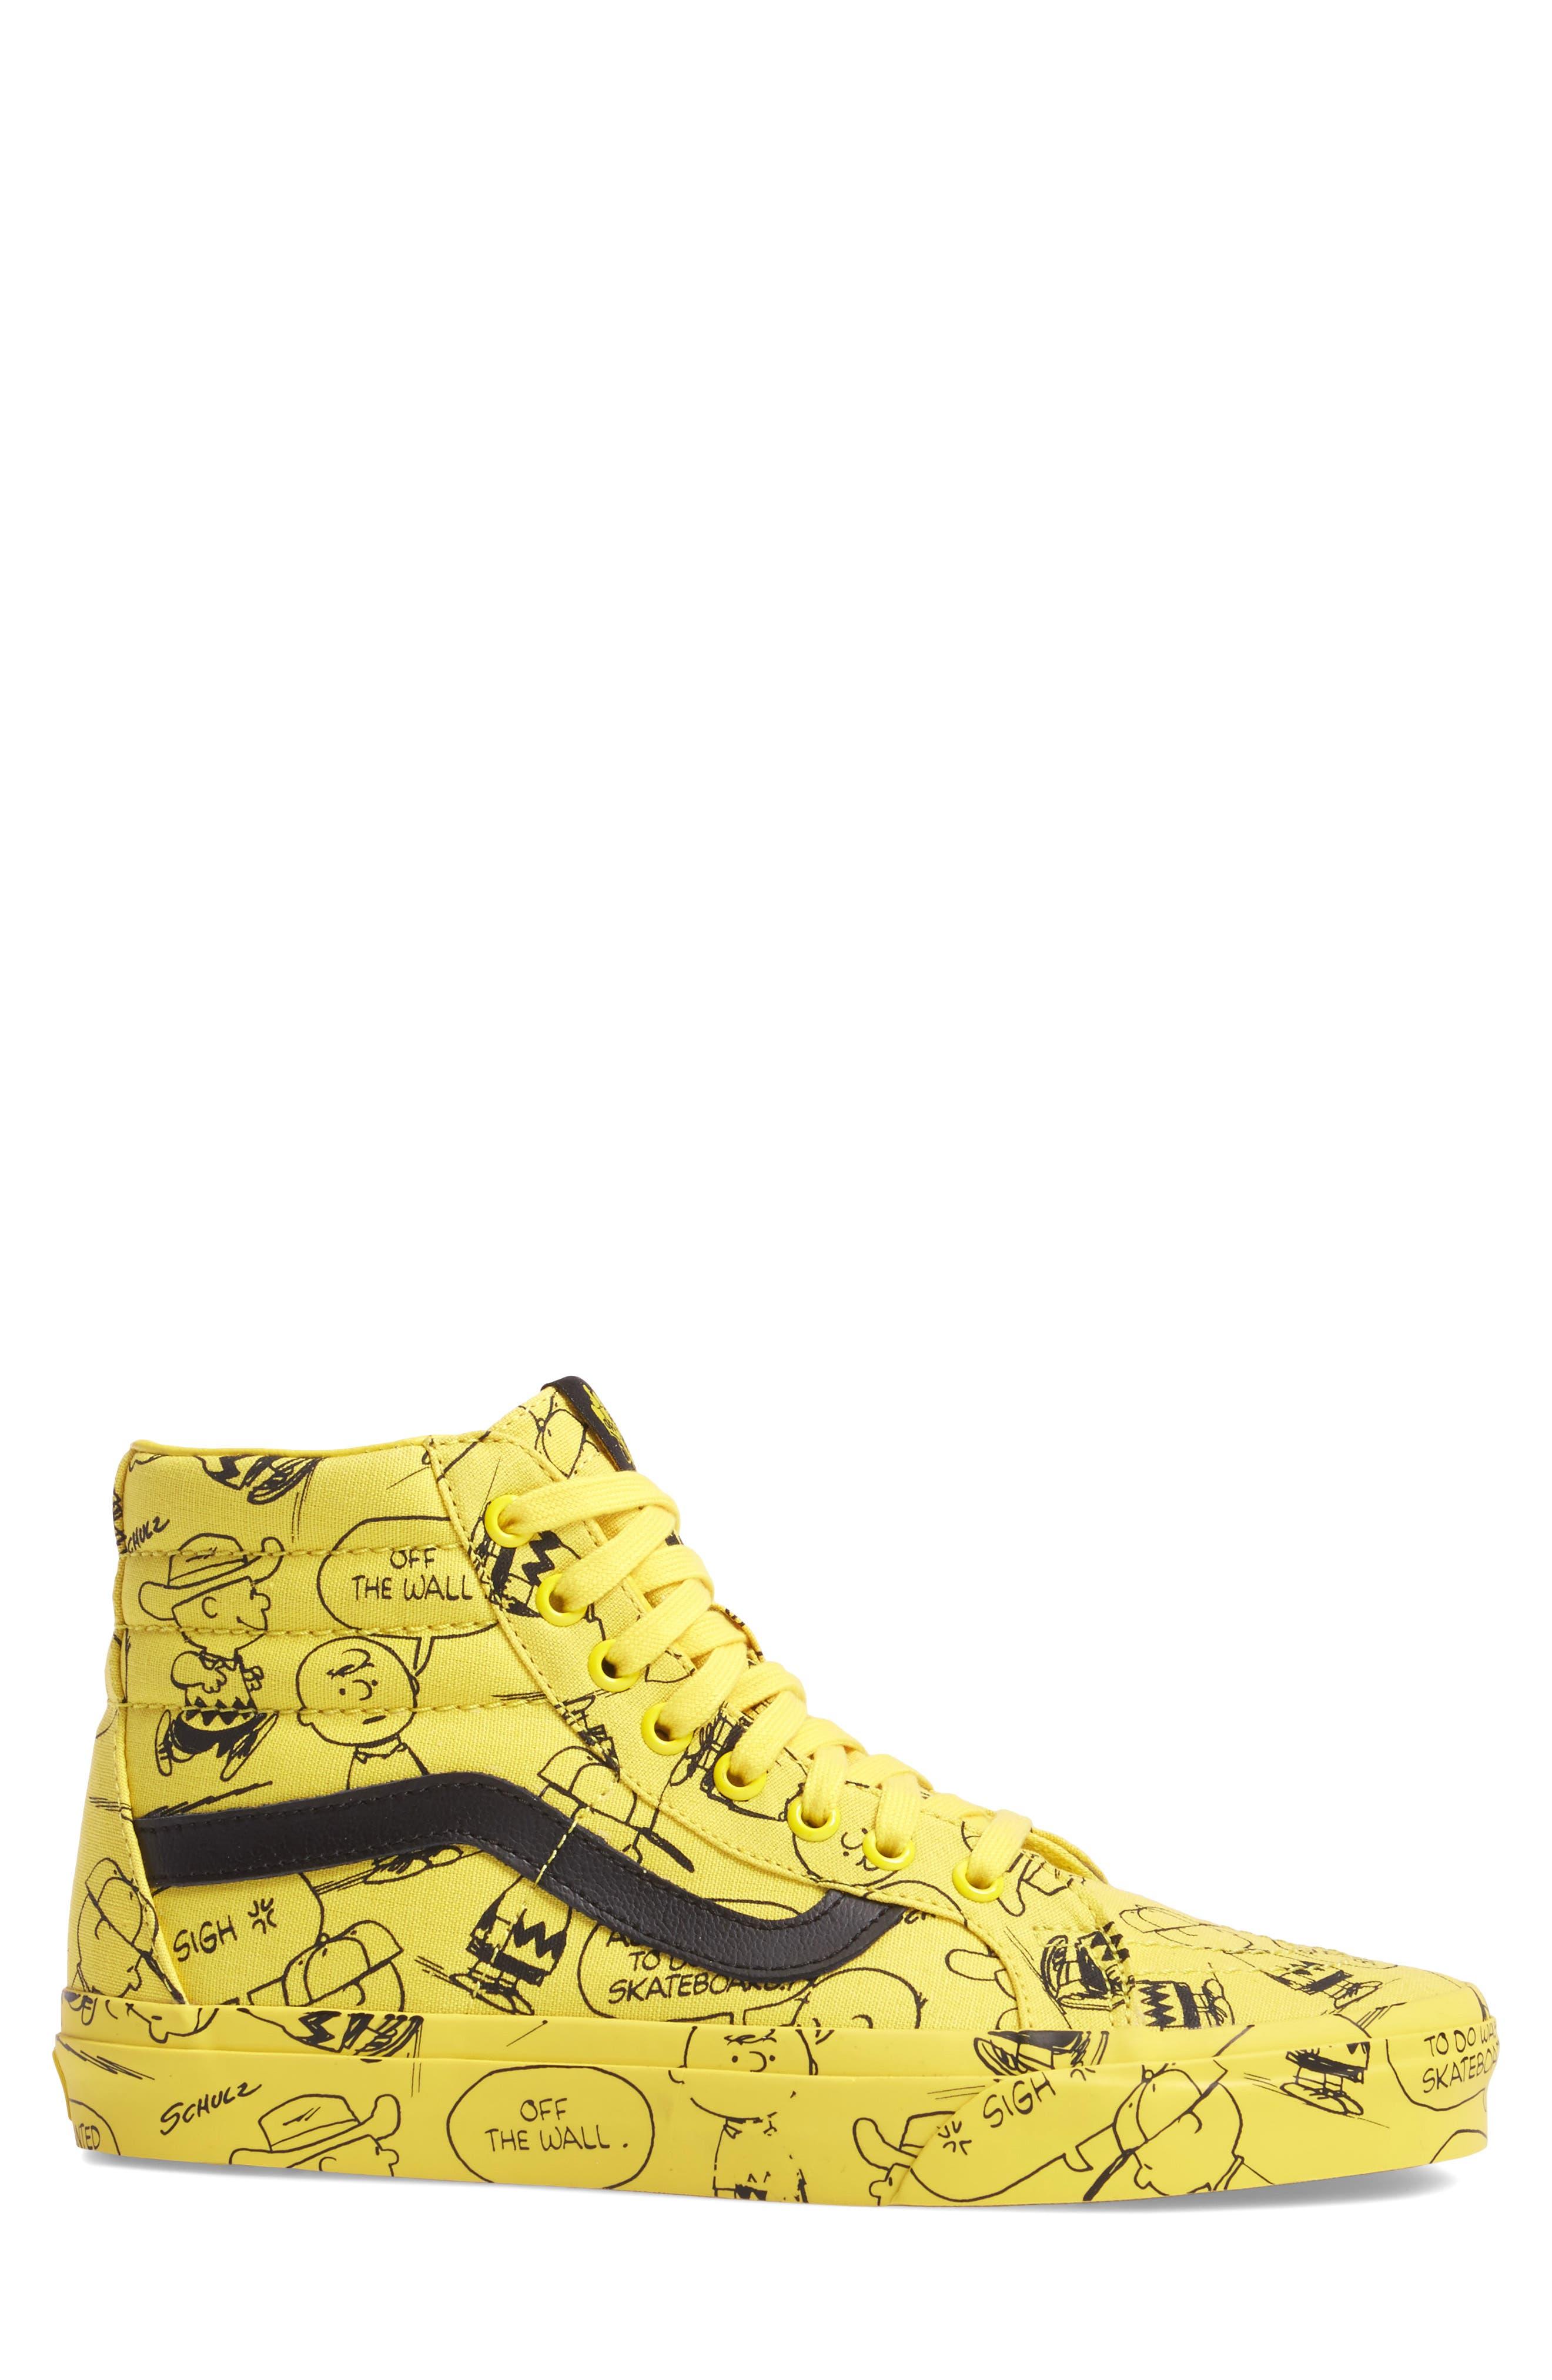 x Peanuts<sup>®</sup> Sk8-Hi Reissue Sneaker,                             Alternate thumbnail 3, color,                             760